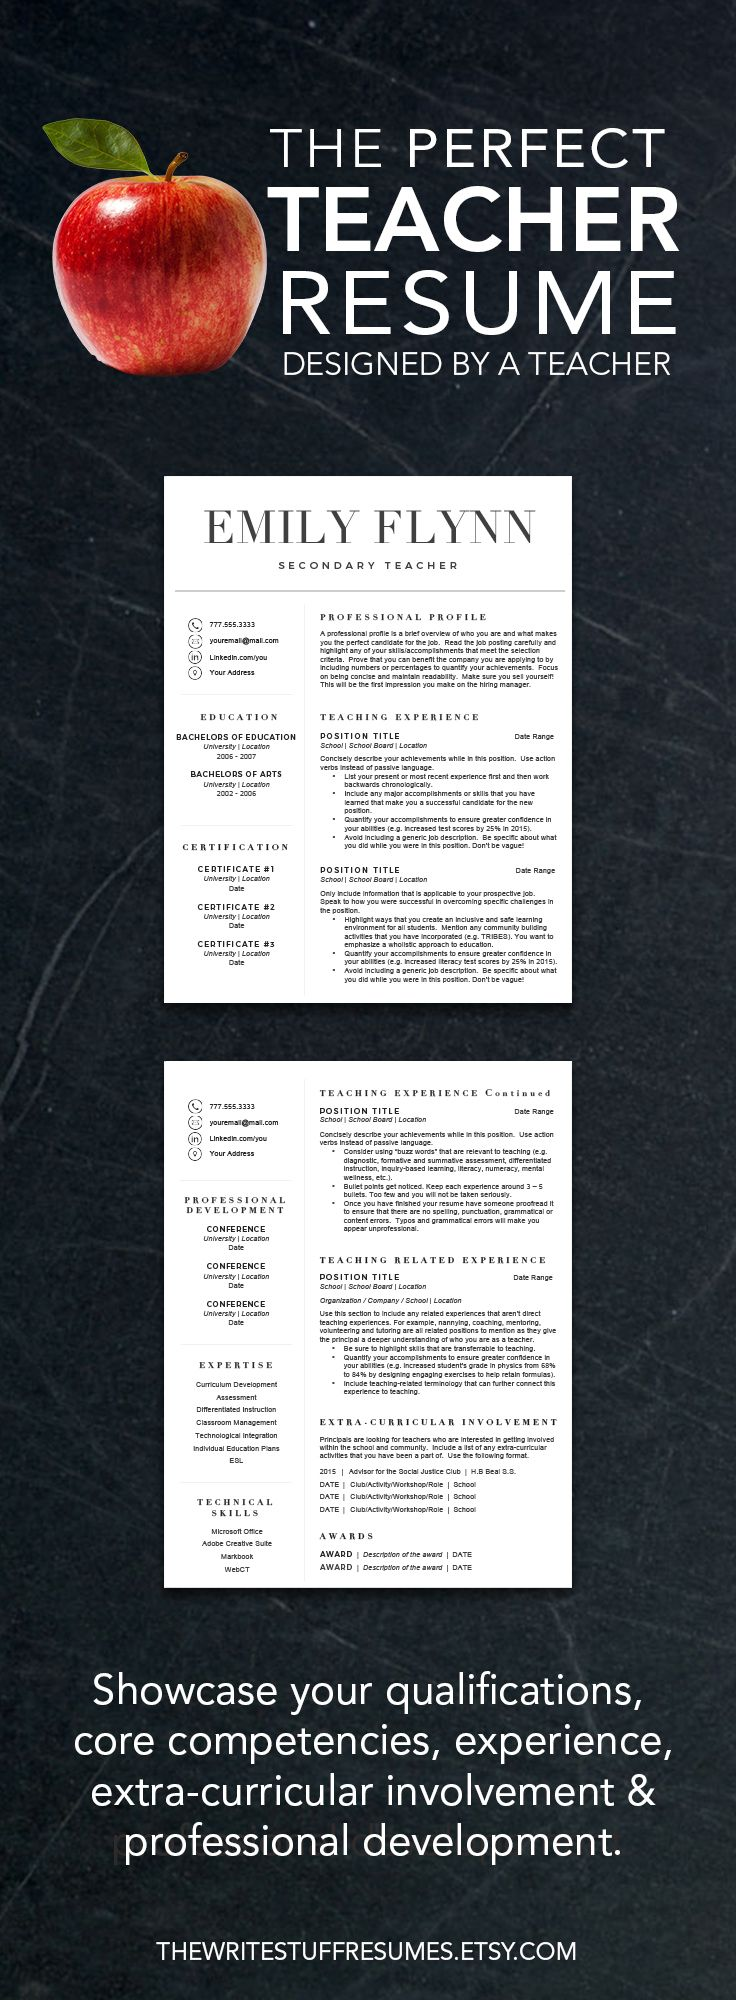 Best 25 Teacher resume template ideas on Pinterest  Resume templates for students Application